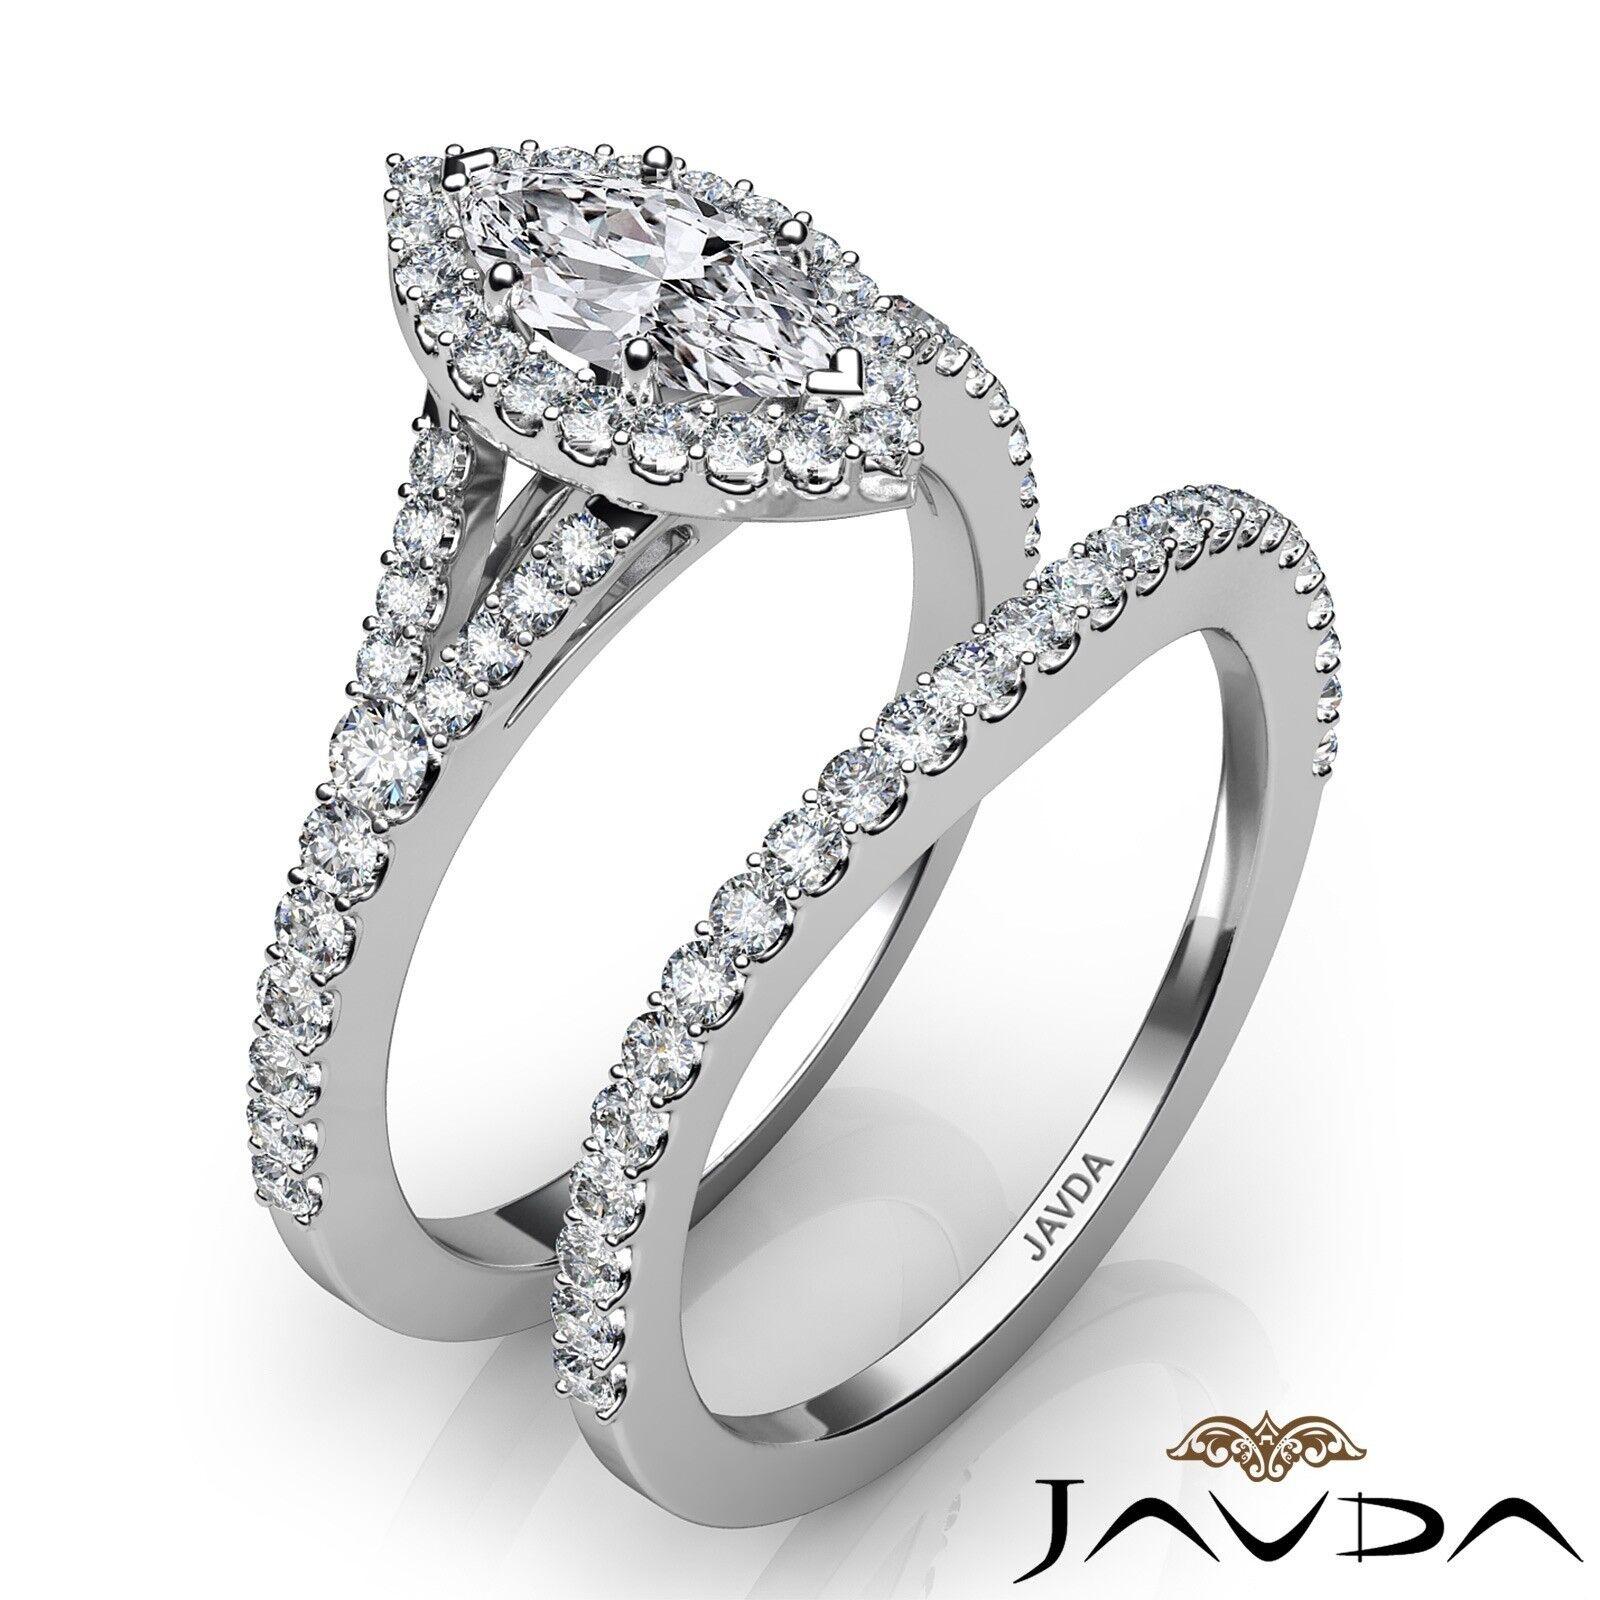 2.02ctw Halo Bridal Set Split Shank Marquise Diamond Engagement Ring GIA F-SI1 2